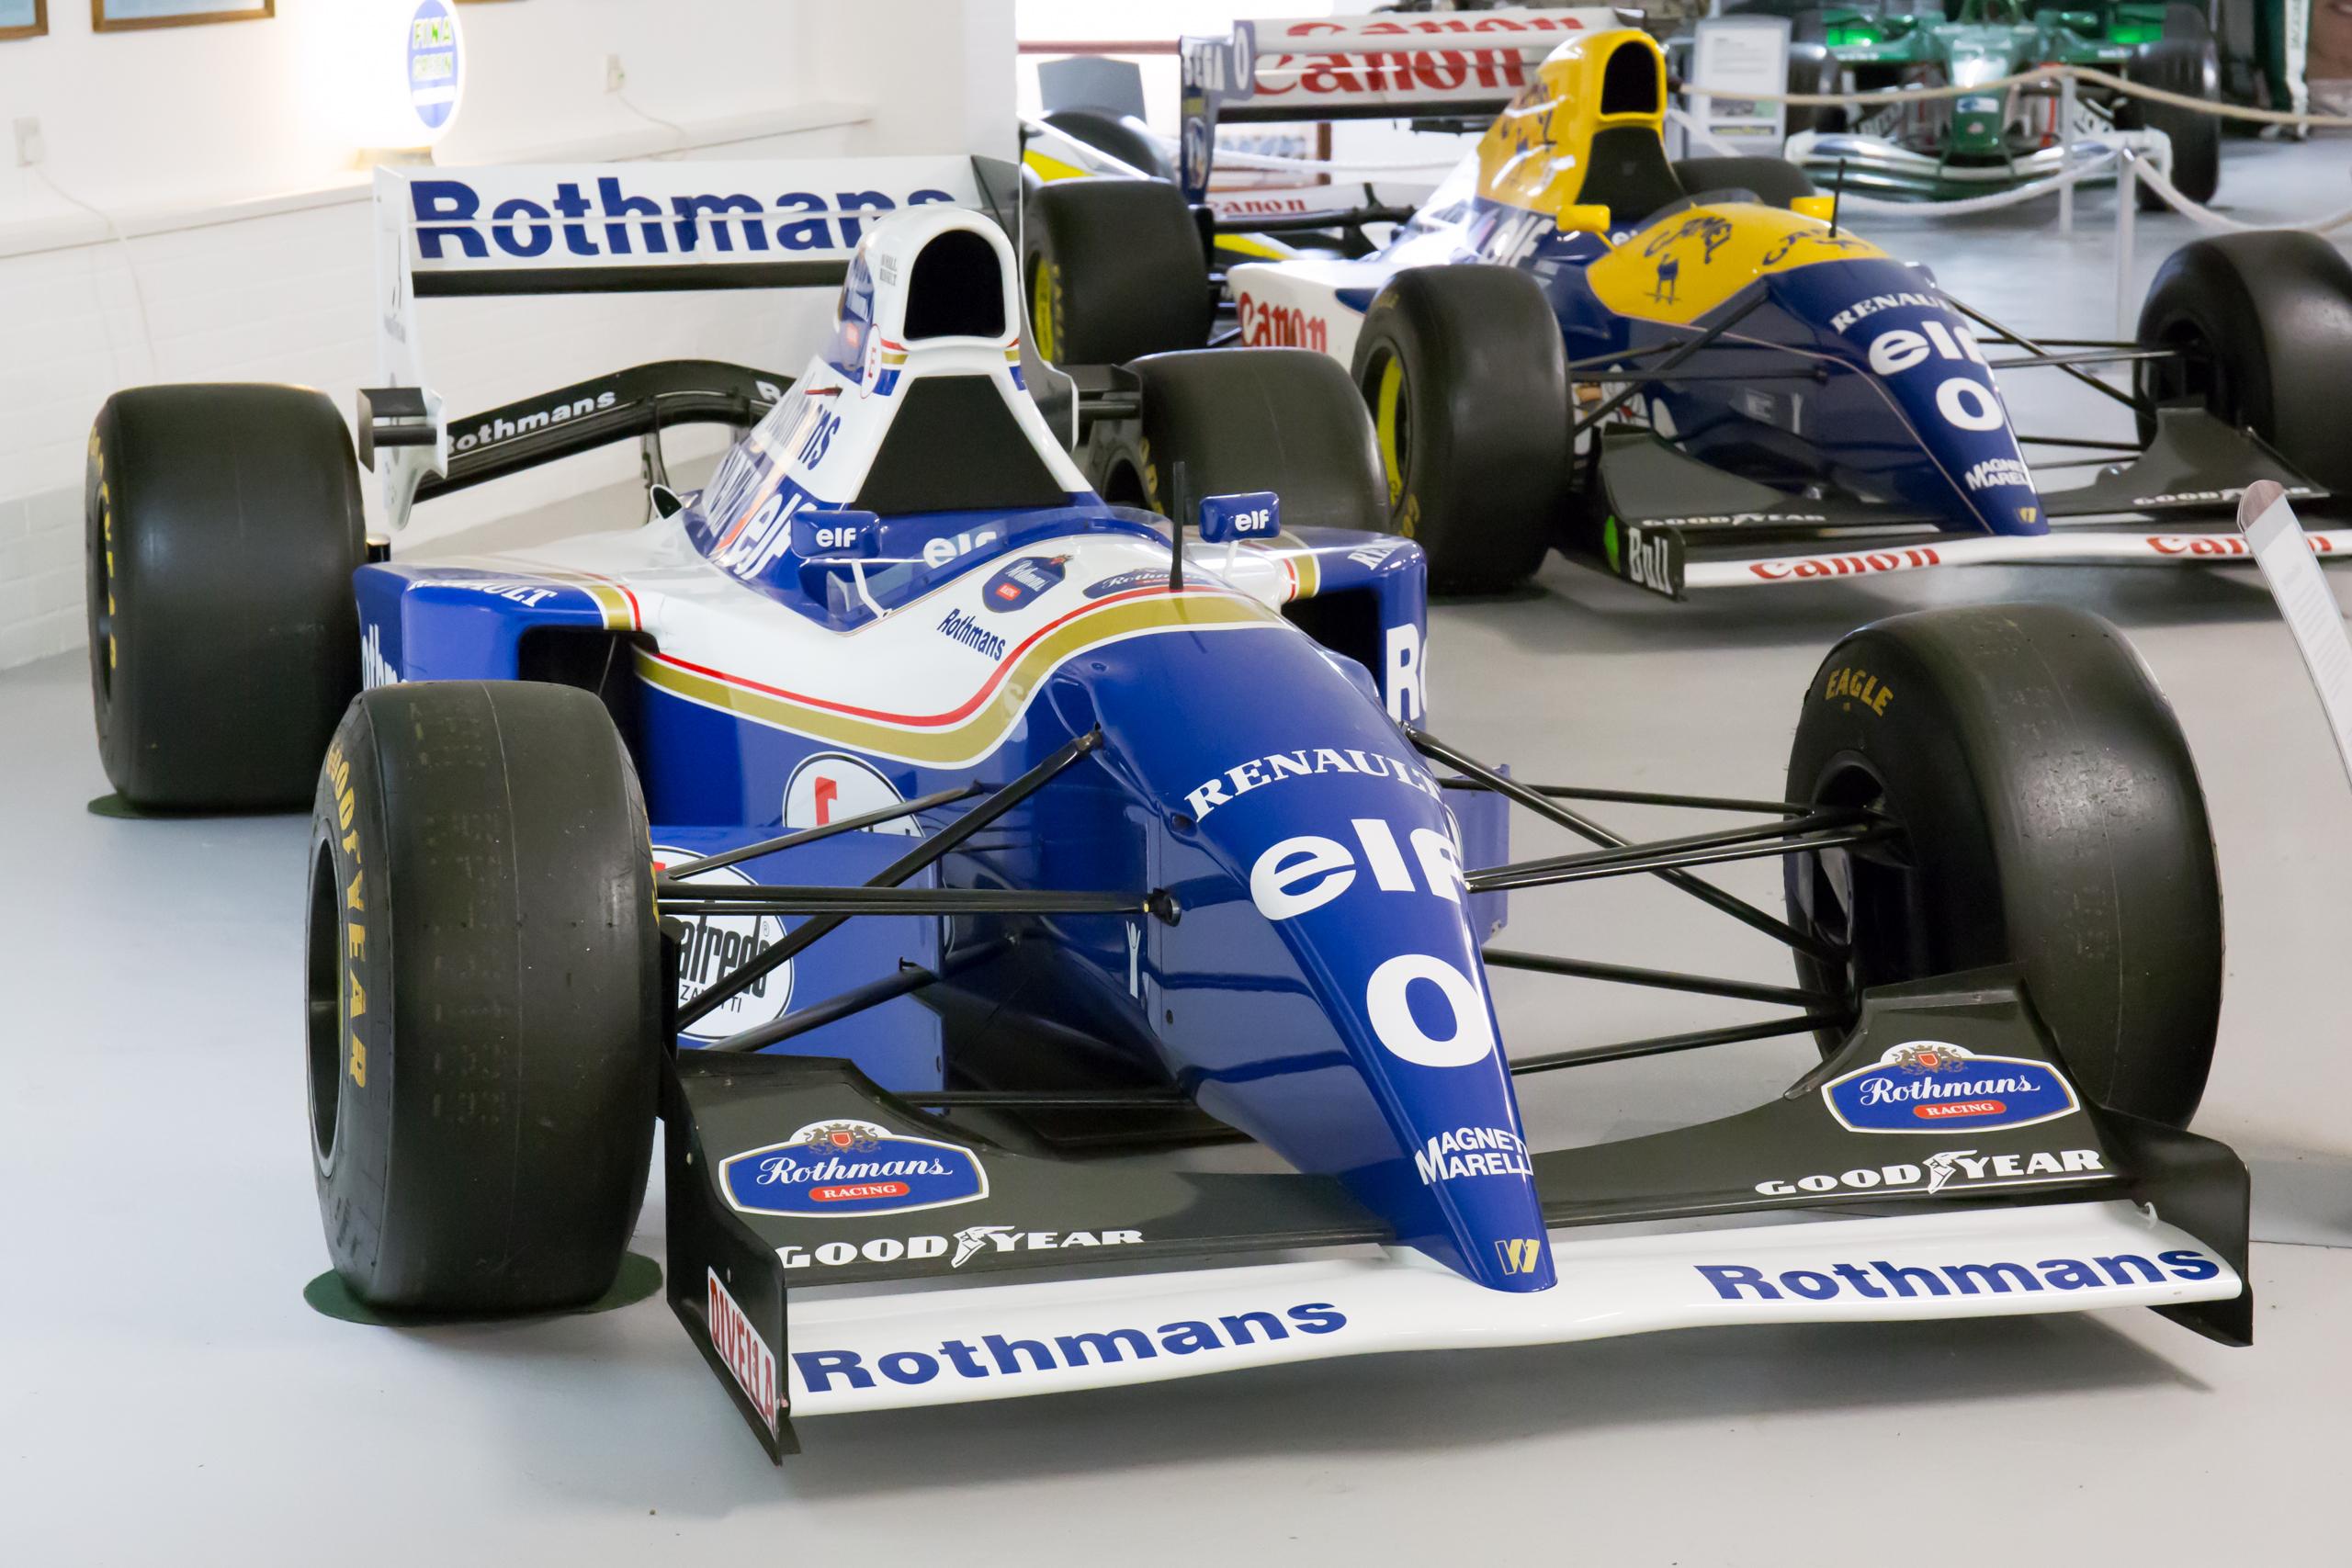 Williams_FW16B_and_FW15C_Donington_Grand